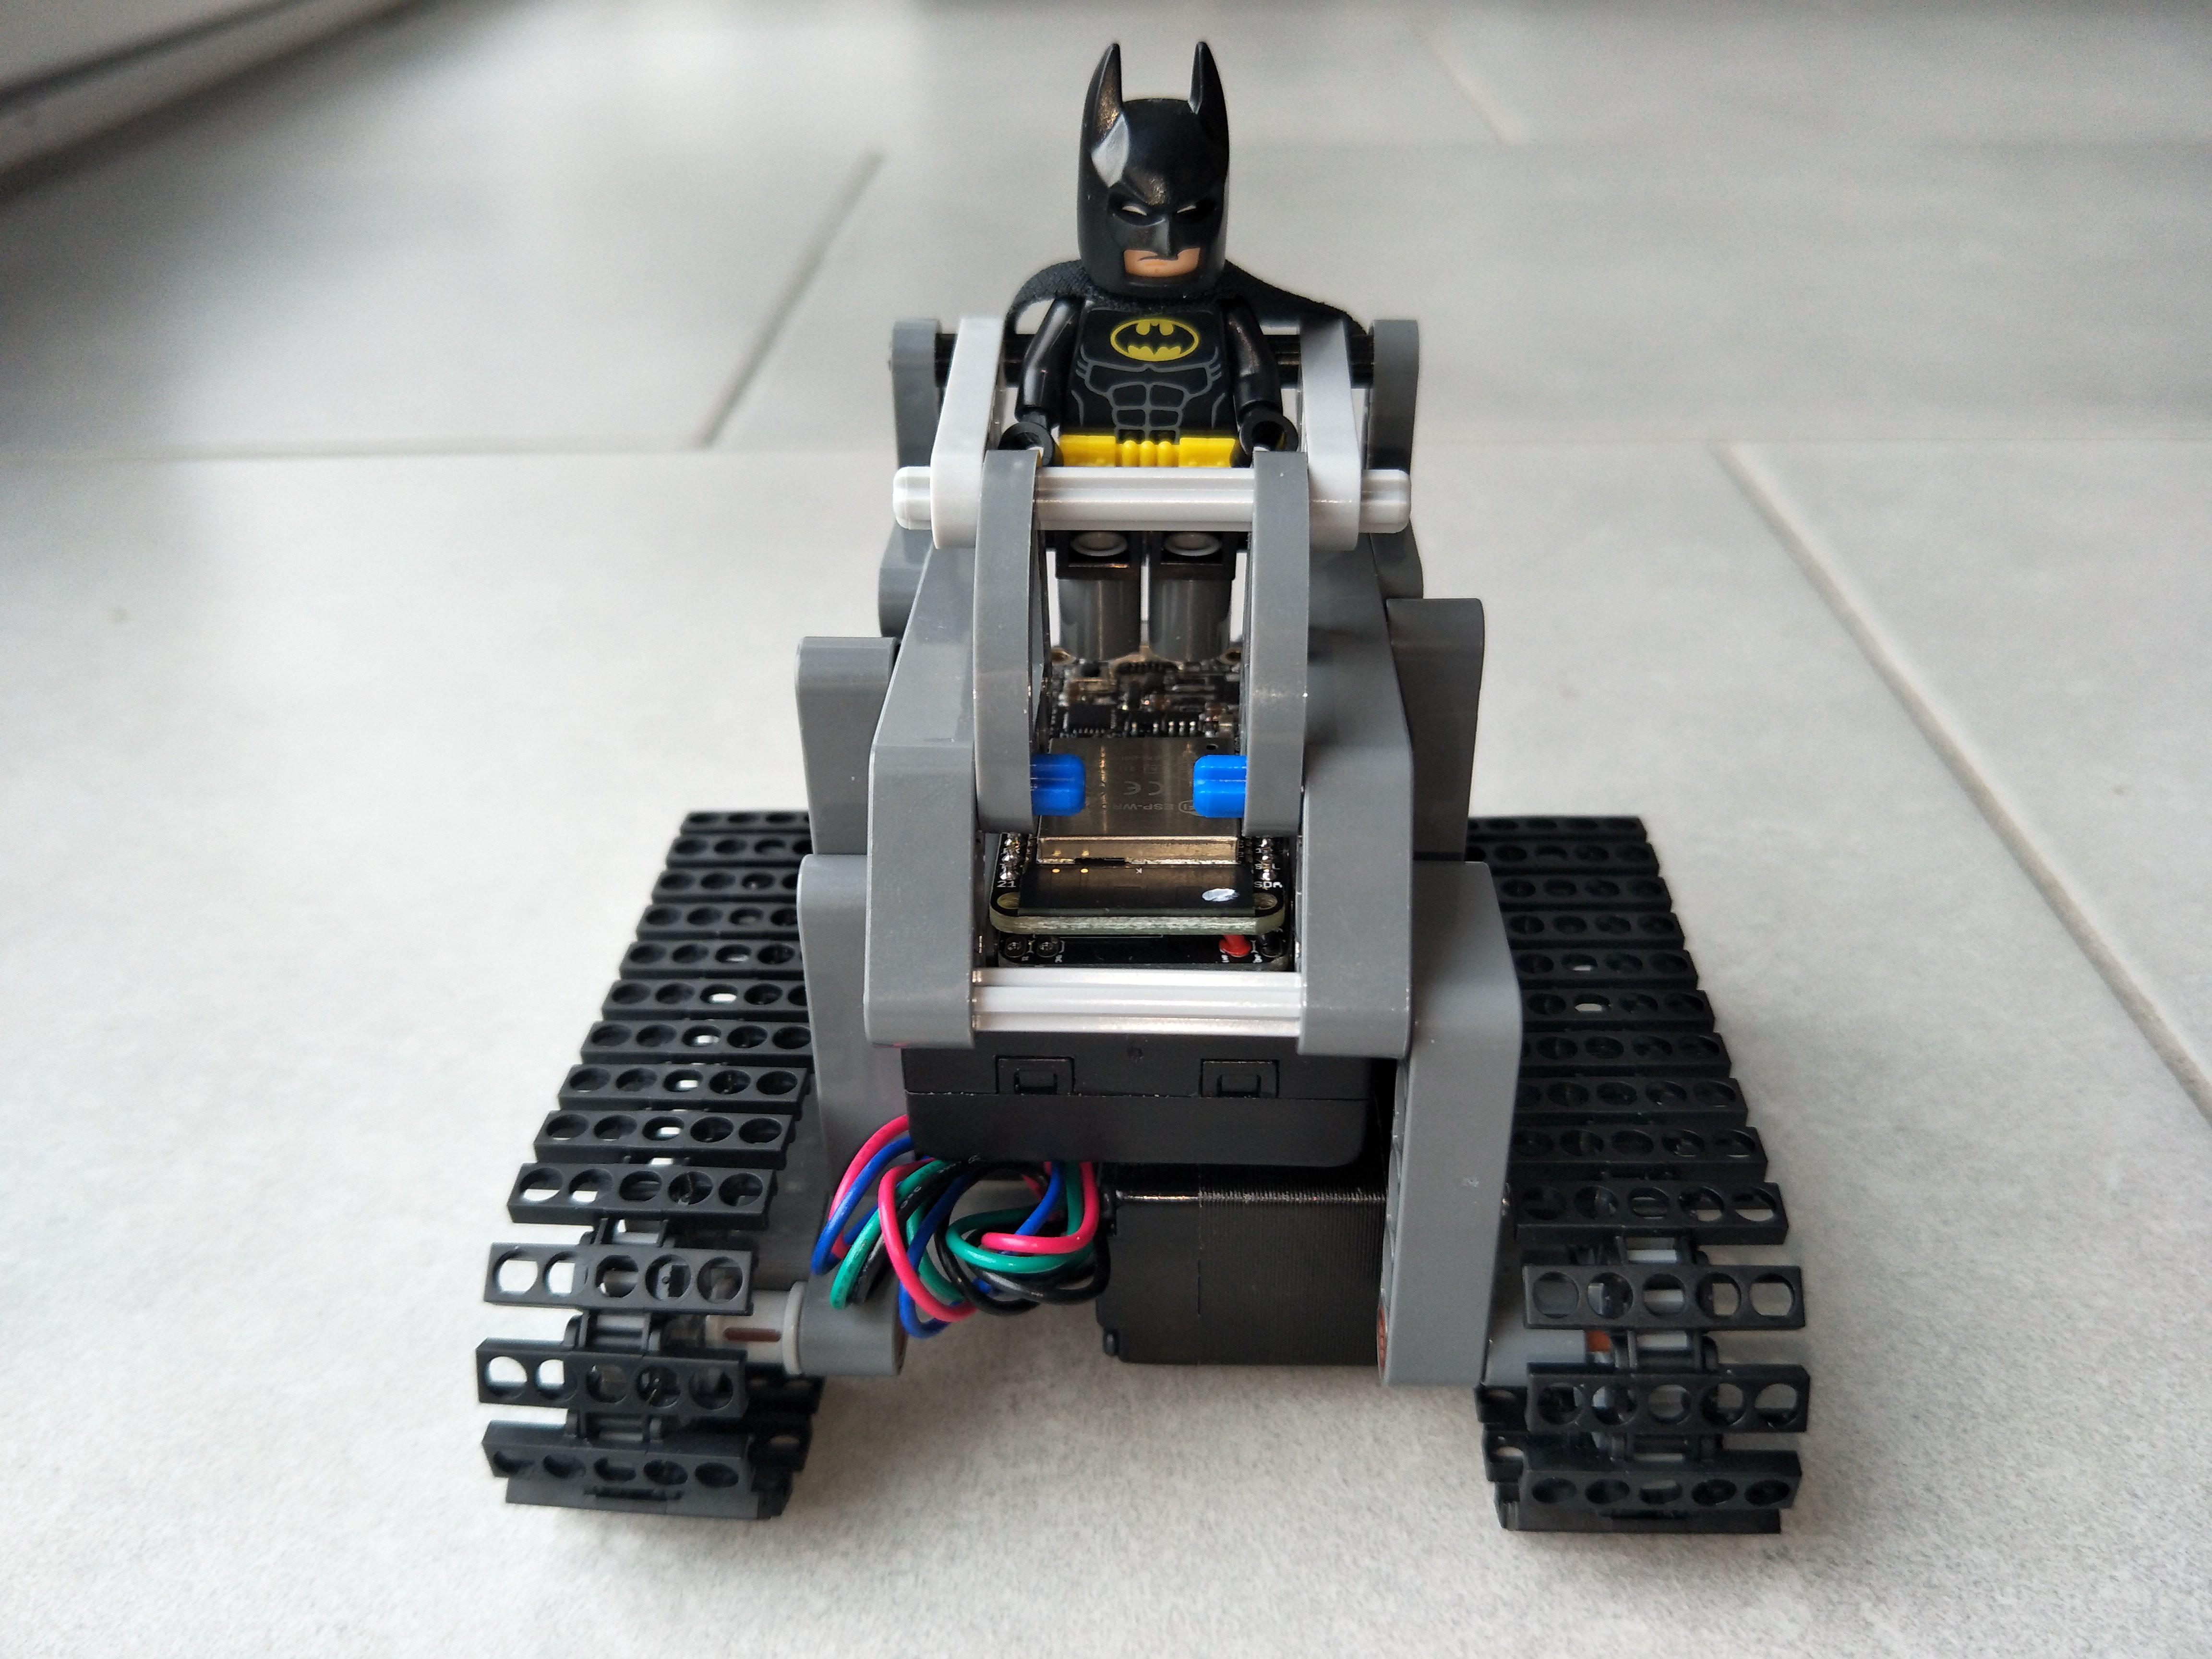 LEGO Technic Mini Tank with ESP32 & 2x NEMA 8 Stepper Motors